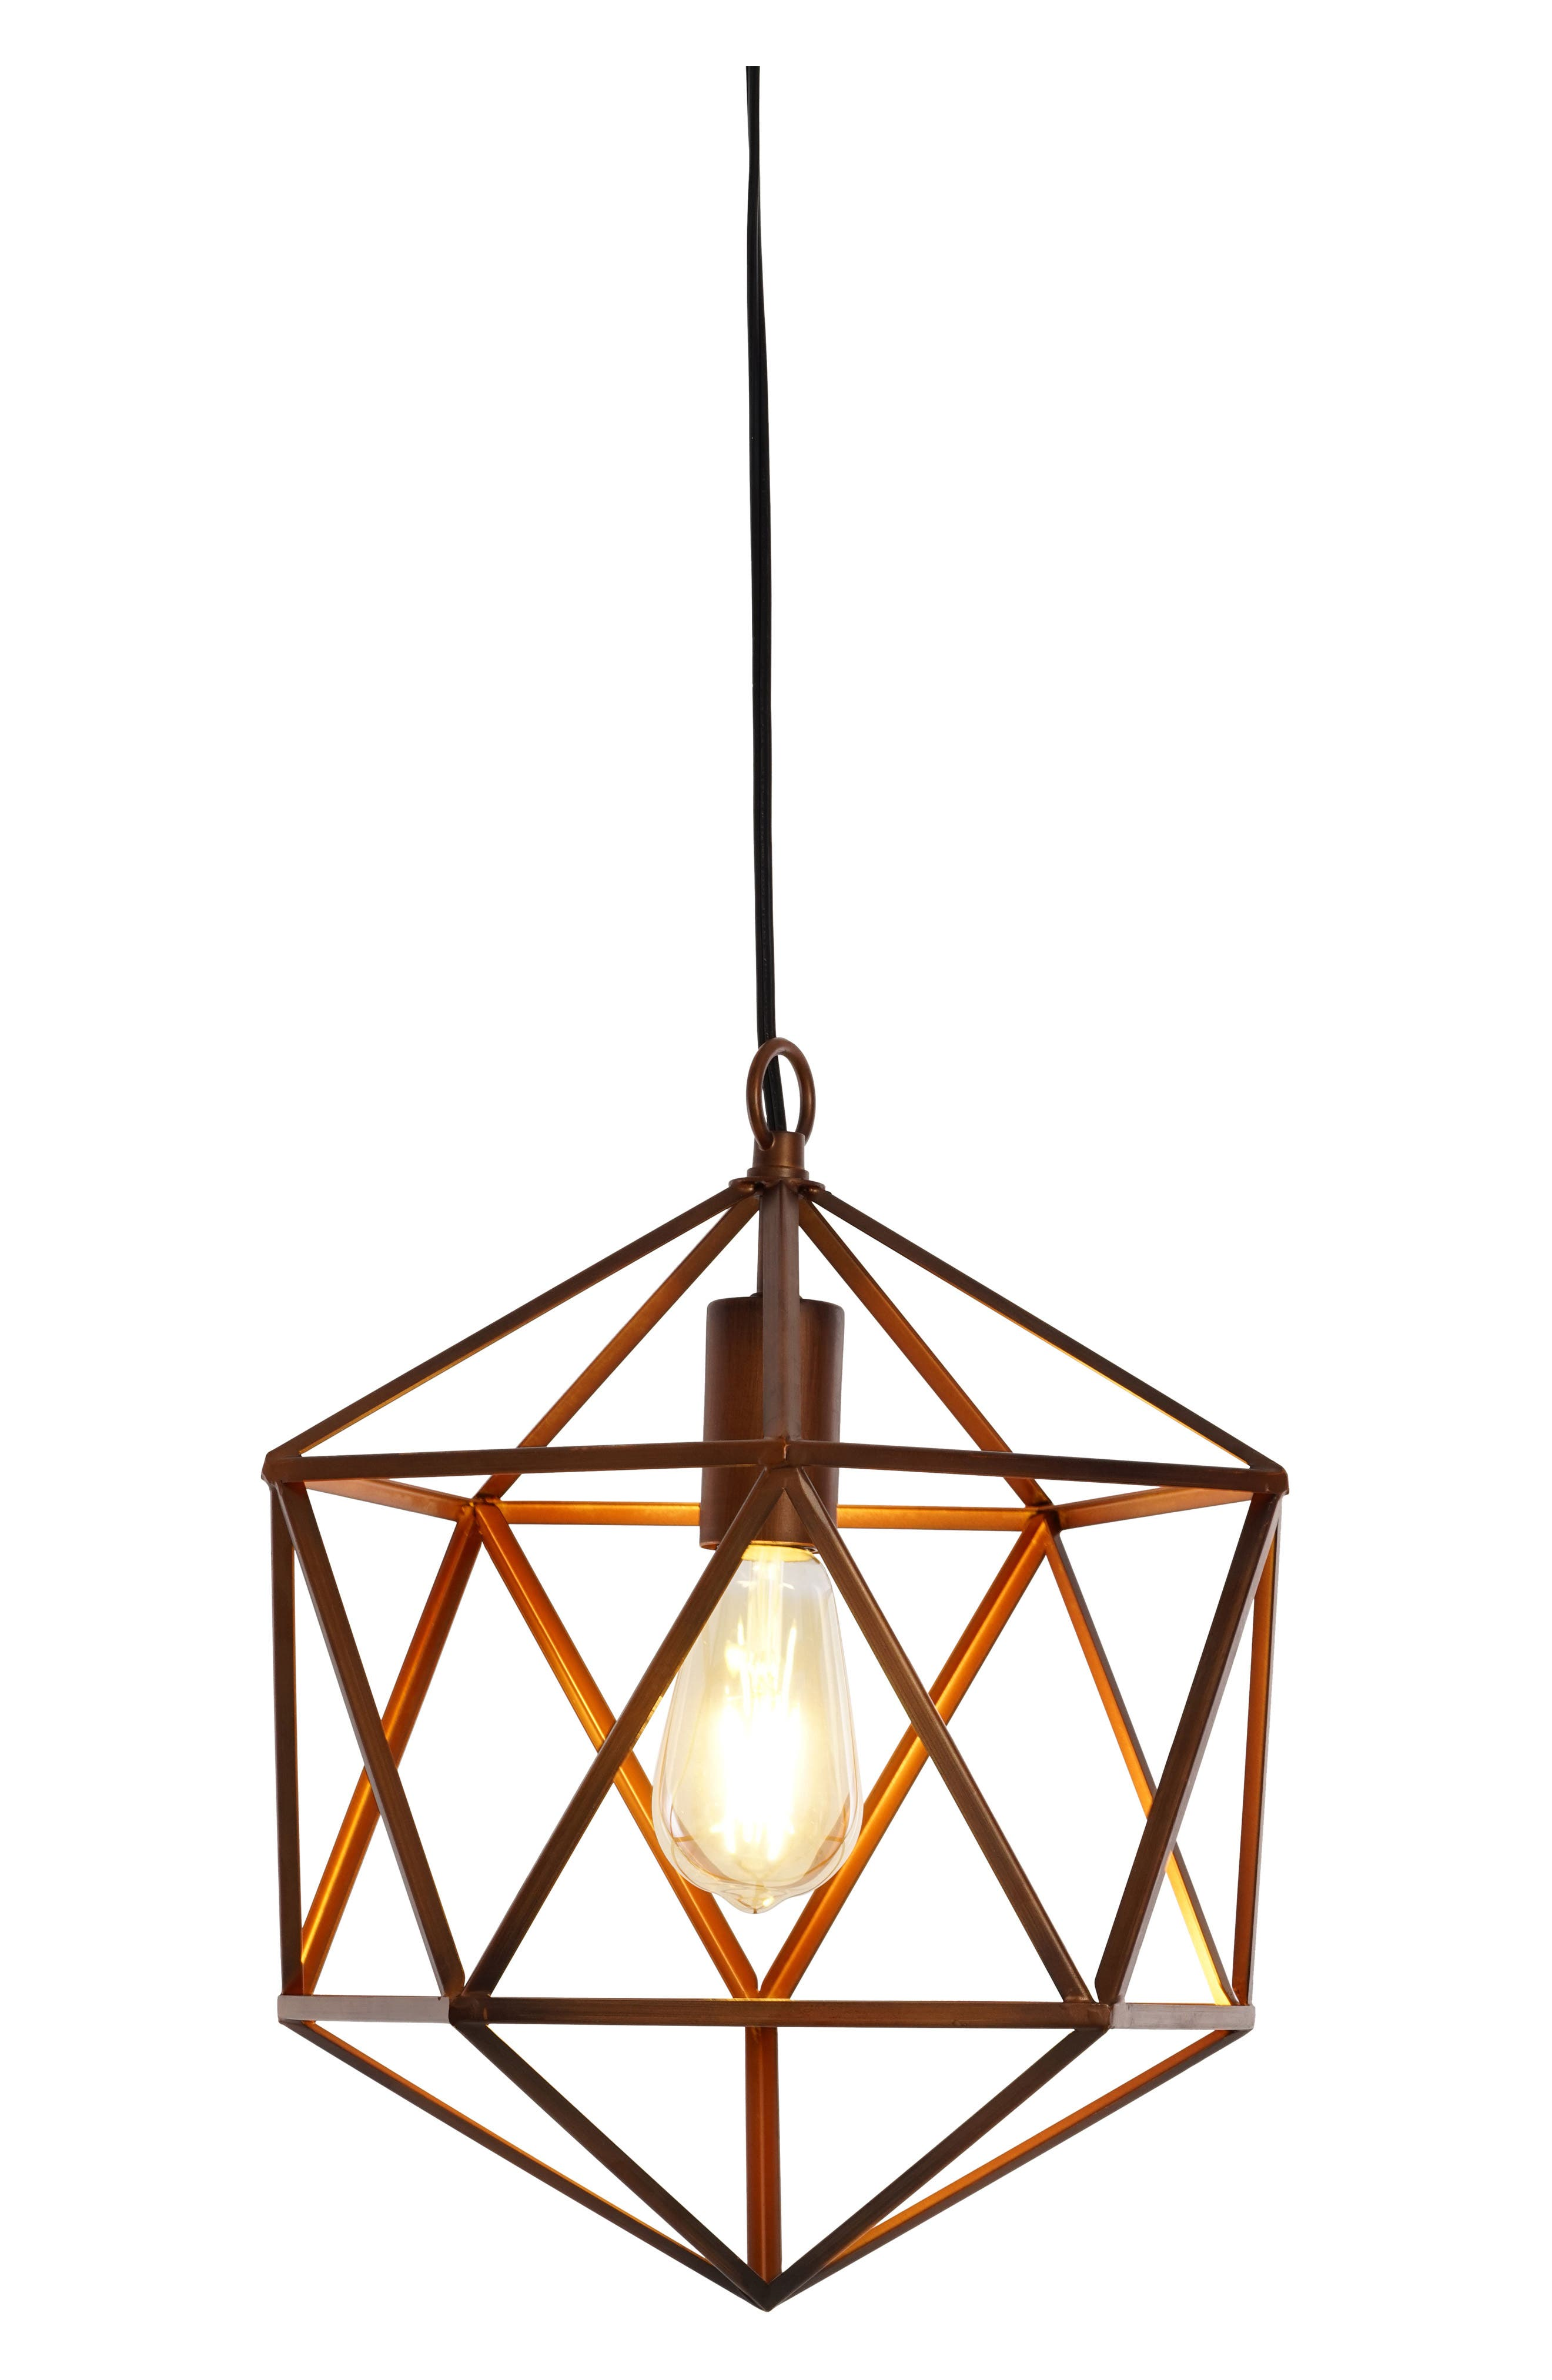 JAlexander Geometric Pendant Light,                             Main thumbnail 1, color,                             200